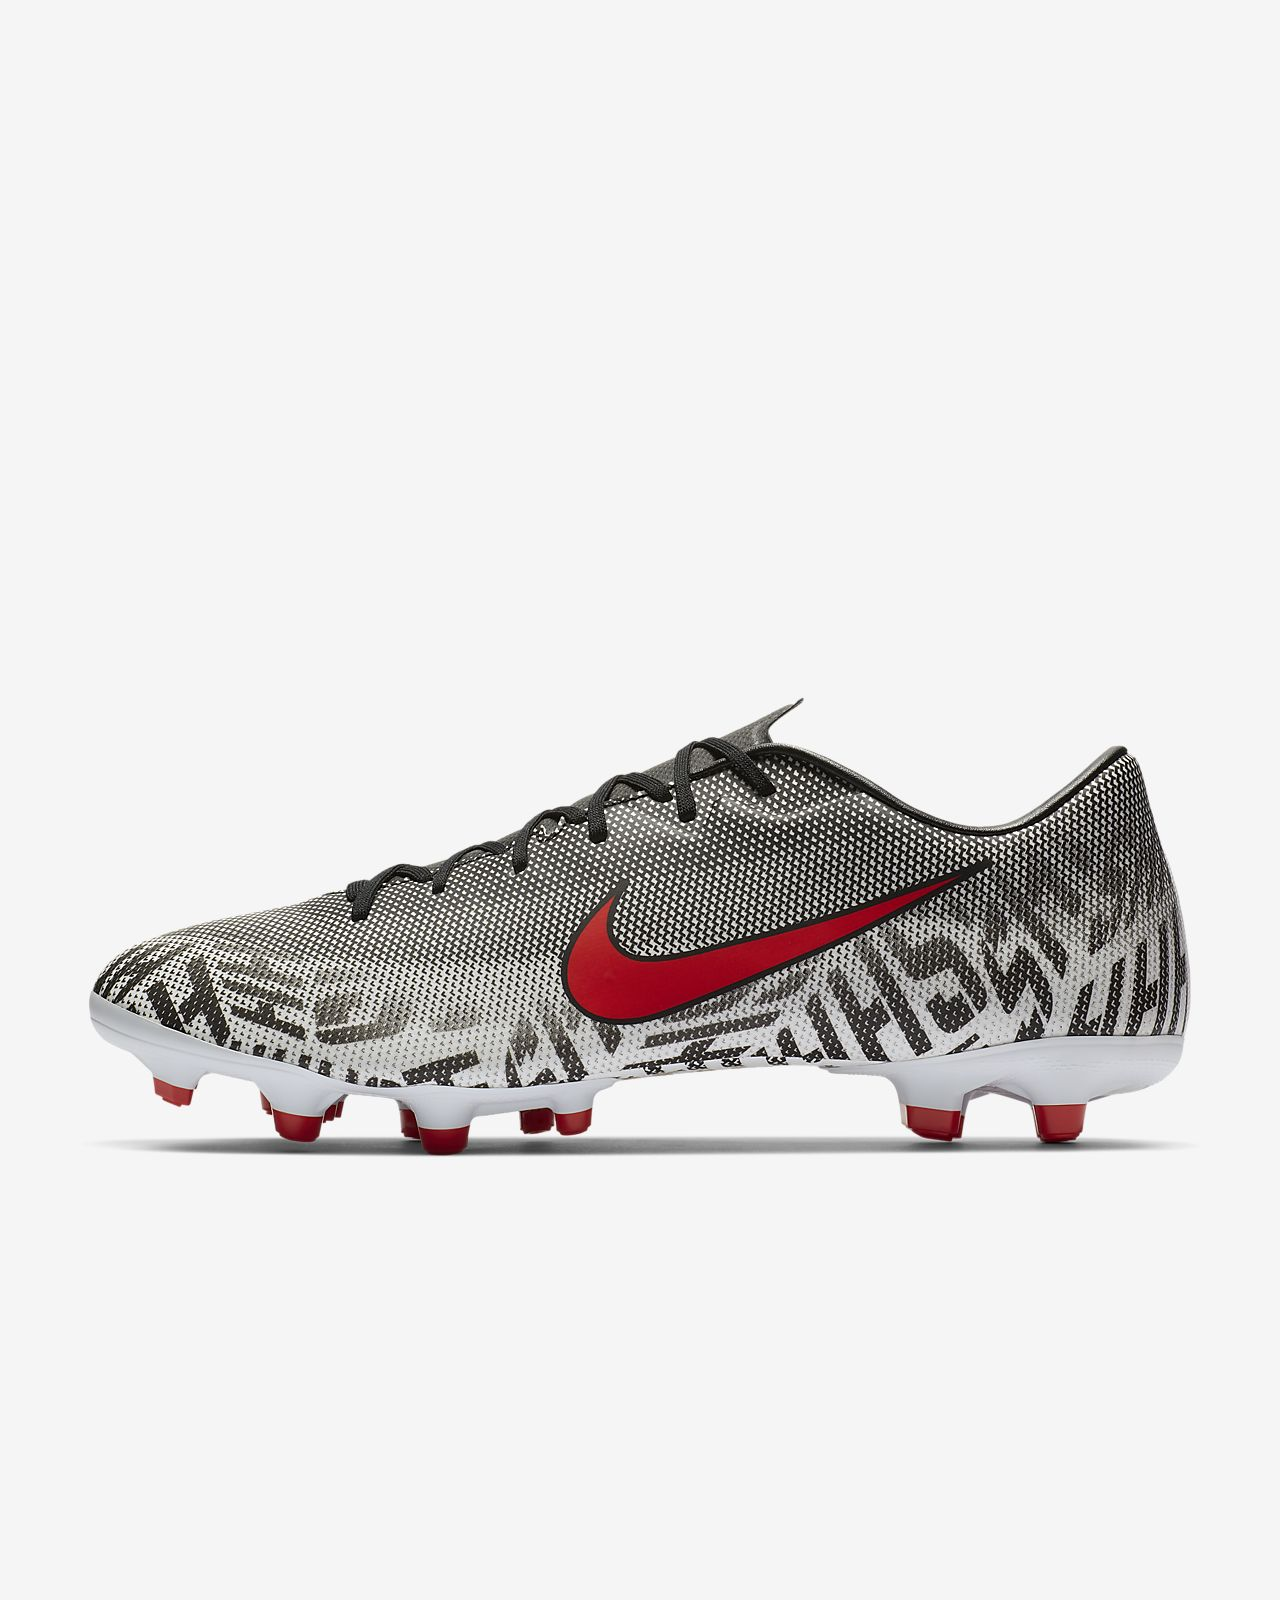 Calzado de fútbol para múltiples superficies Nike Mercurial Vapor XII  Academy Neymar f27445befa3